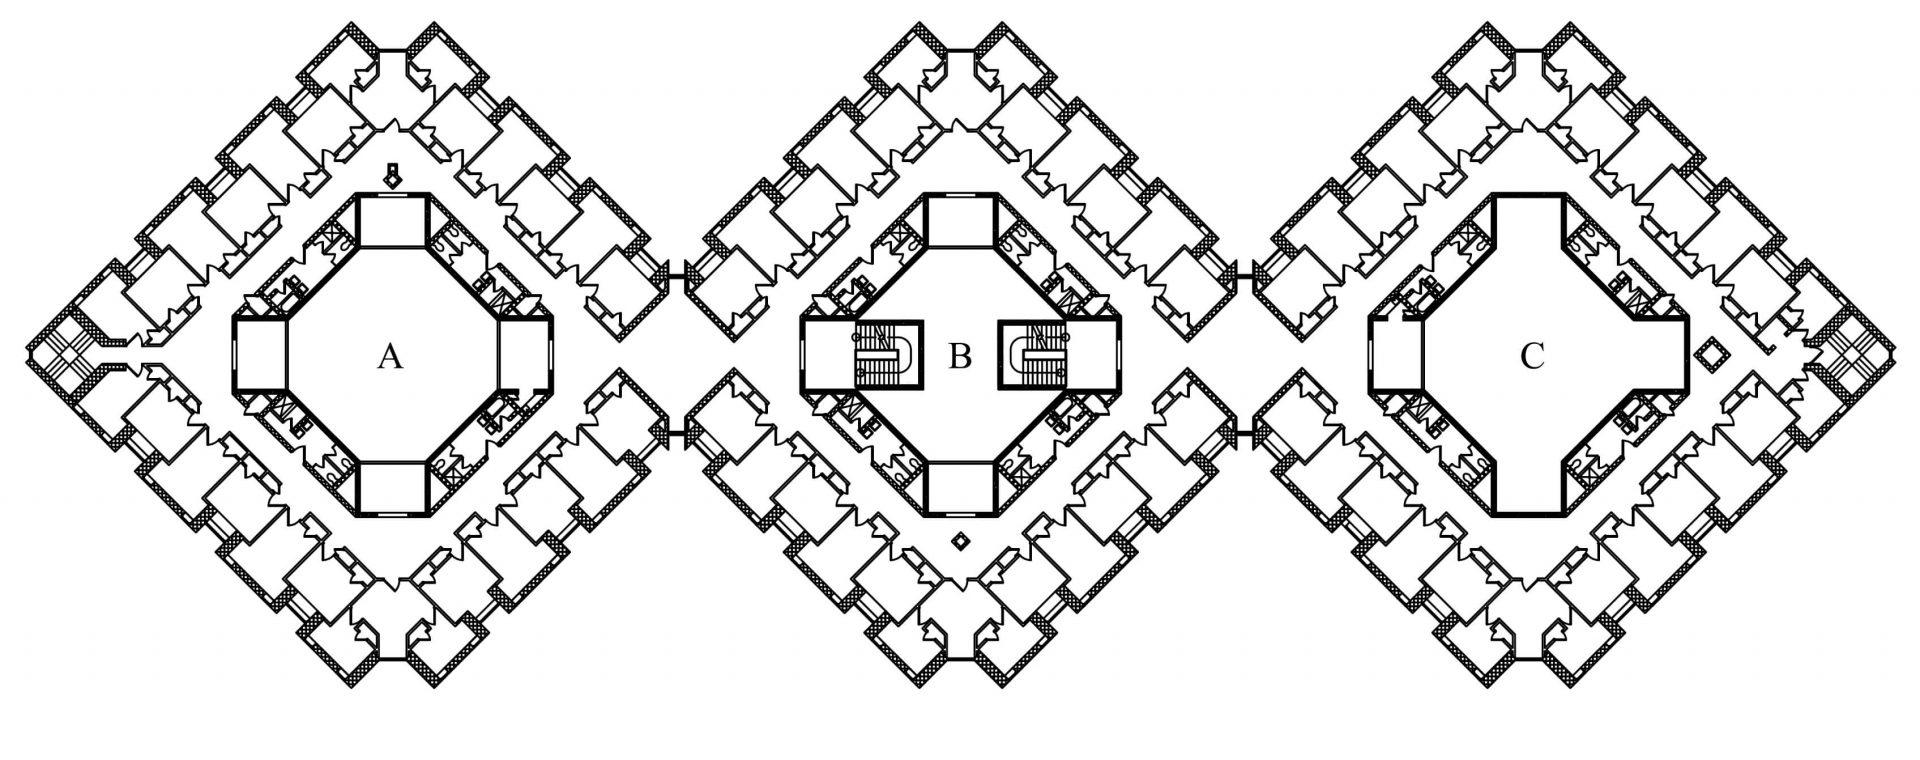 Erdman_Hall_Dormitory_plan